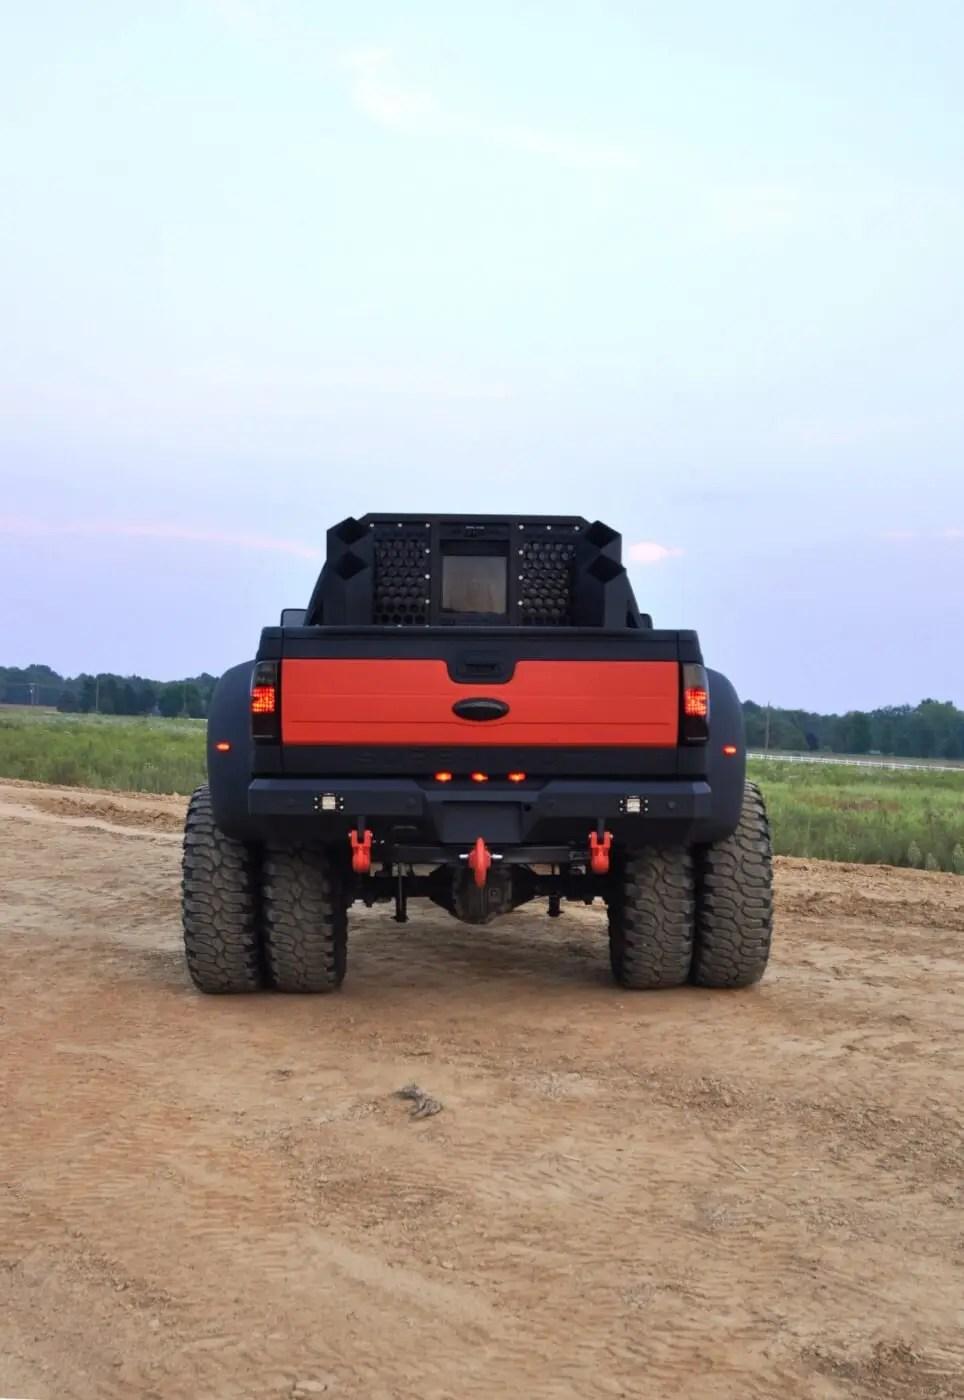 6 Door Ford Truck For Sale : truck, Platinum, F-350, Monster, Truck